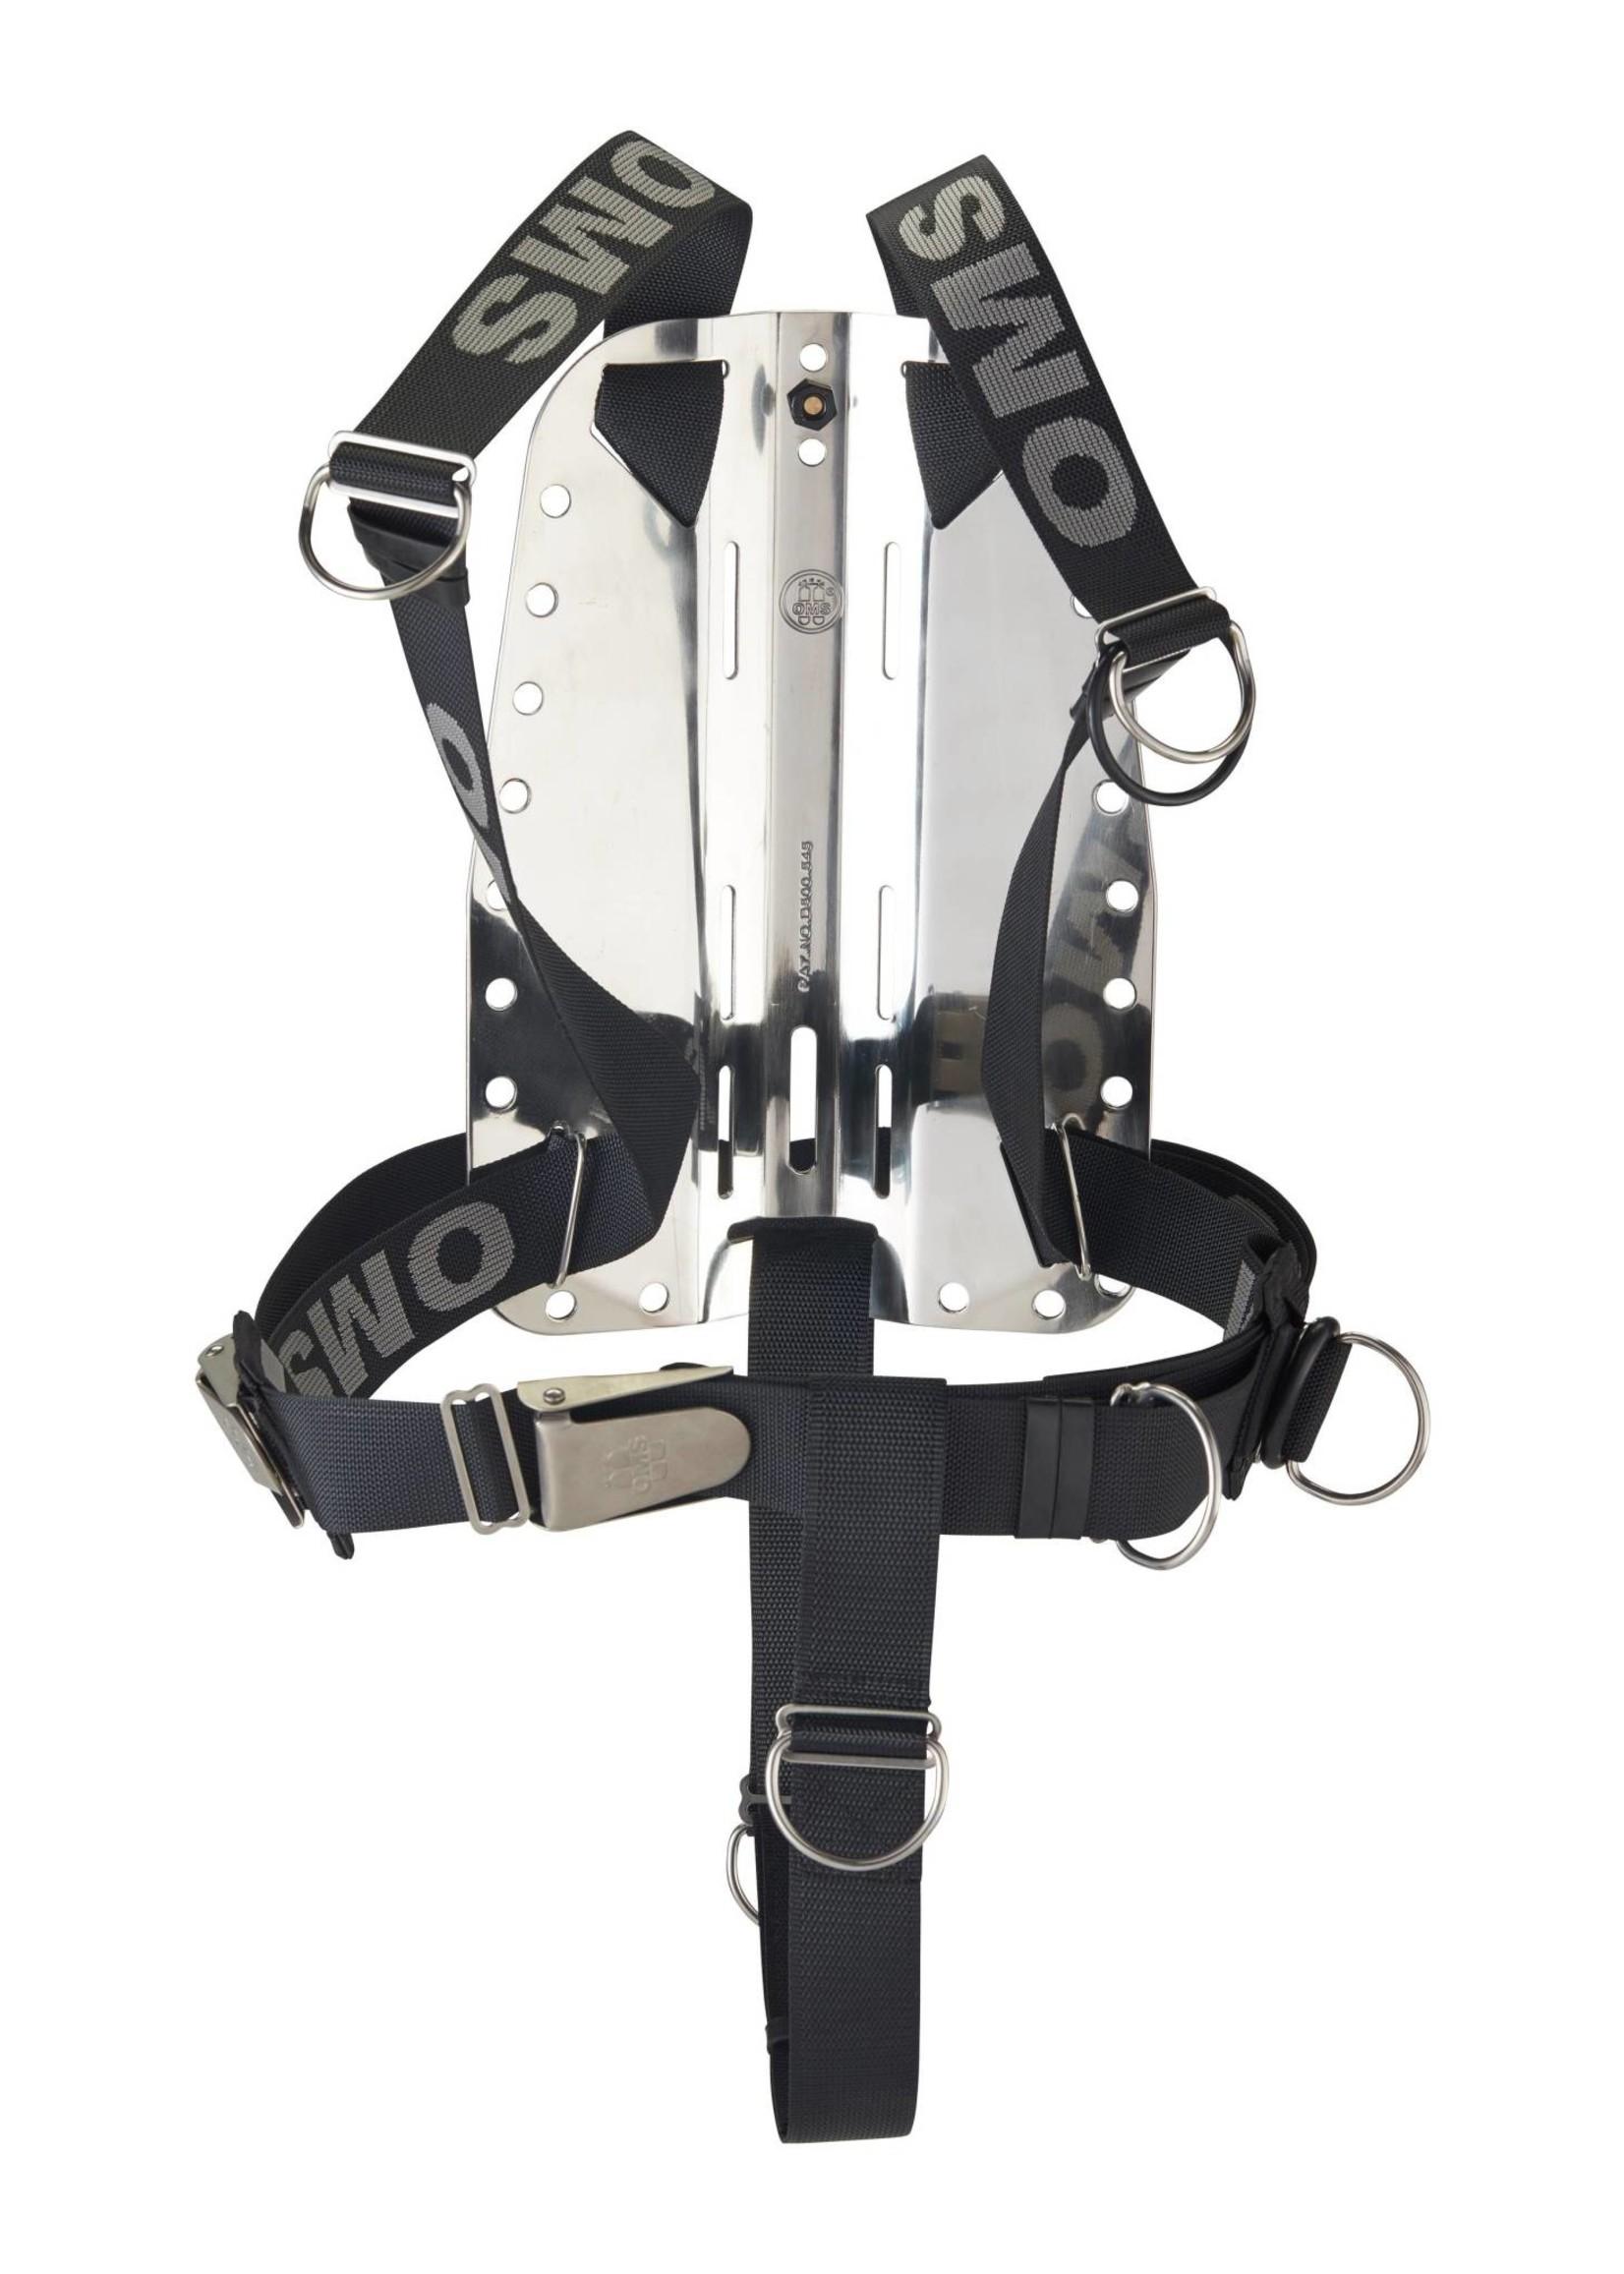 OMS OMS SS backplate met SmartStream Harness en Crotch Strap